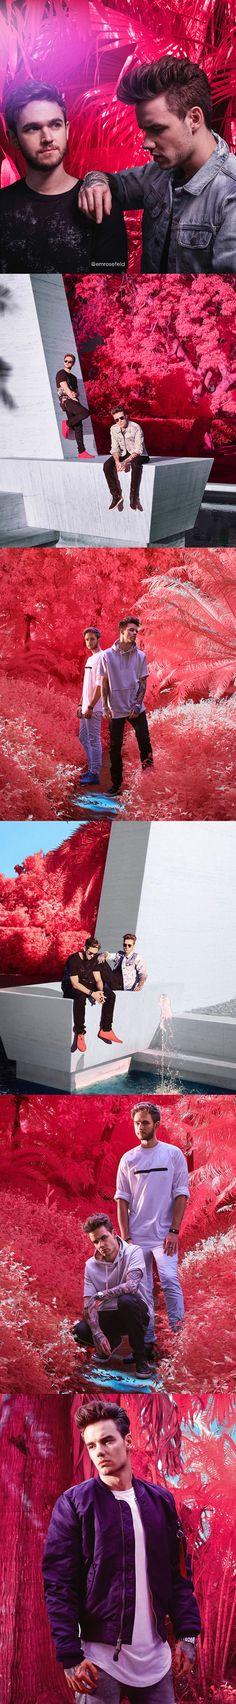 Liam Payne | 'Get Low' | emrosefeld |